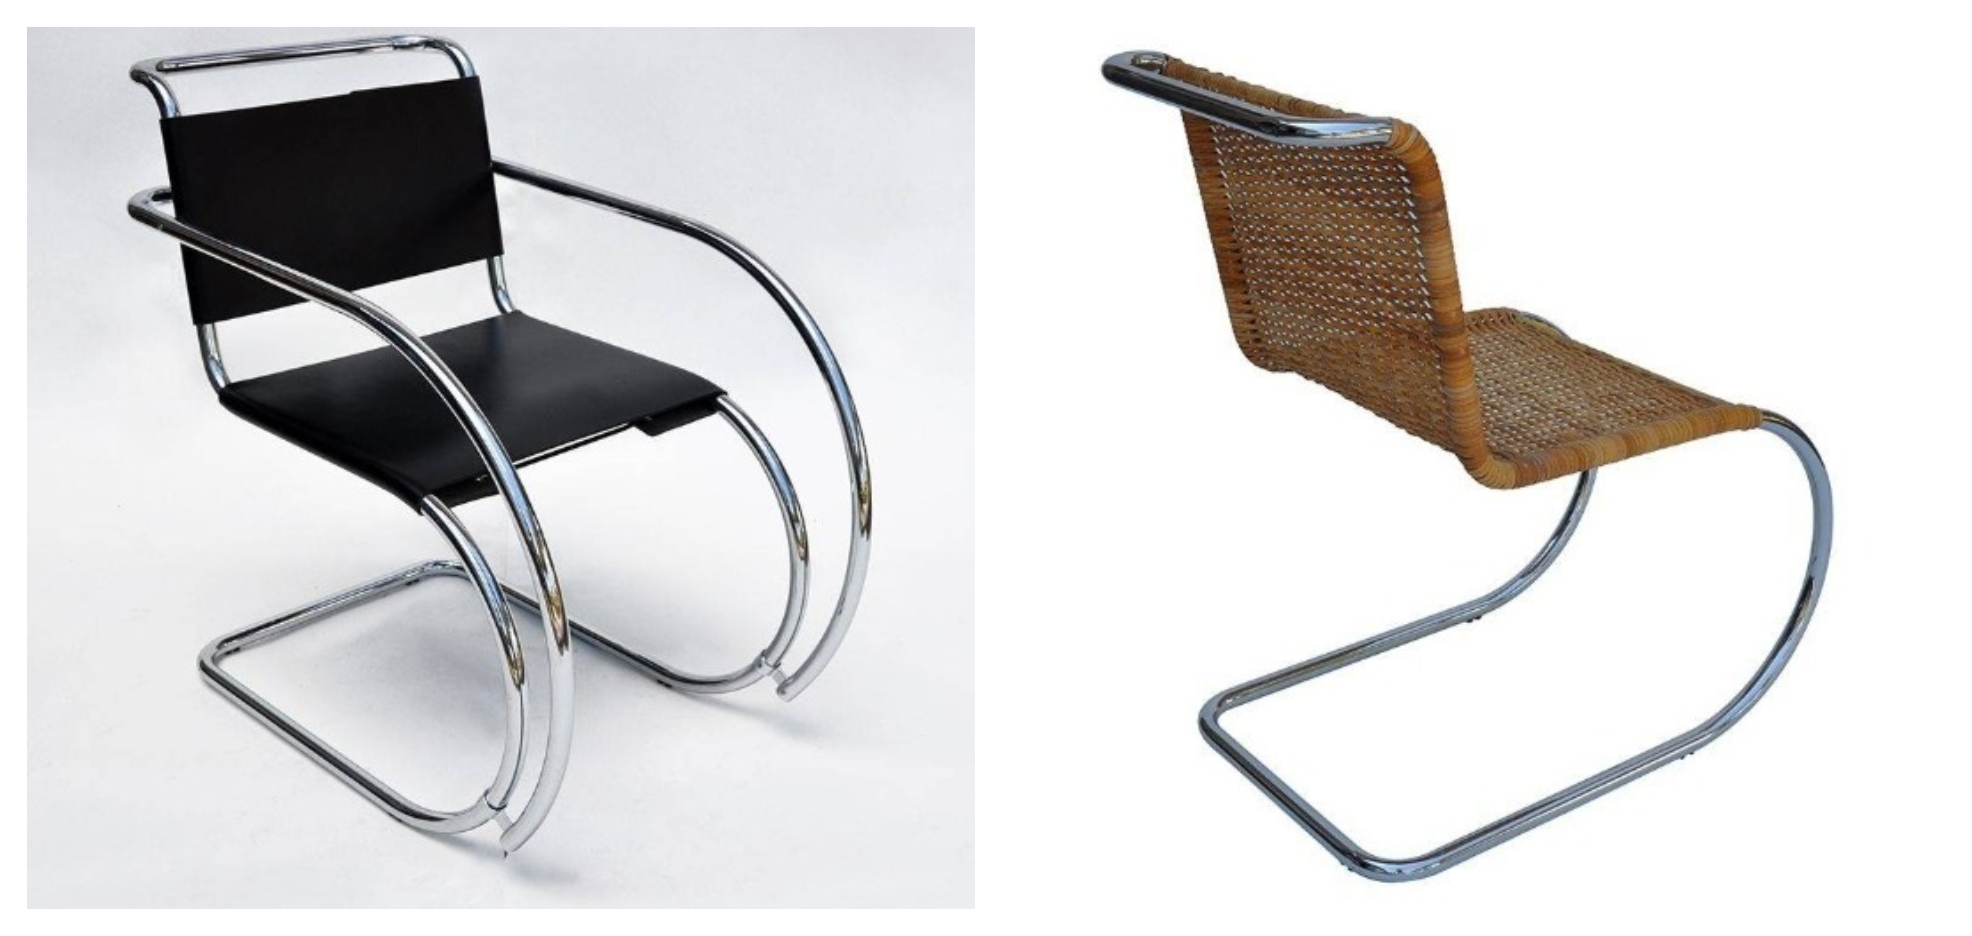 sedie-design-mies-bauhaus